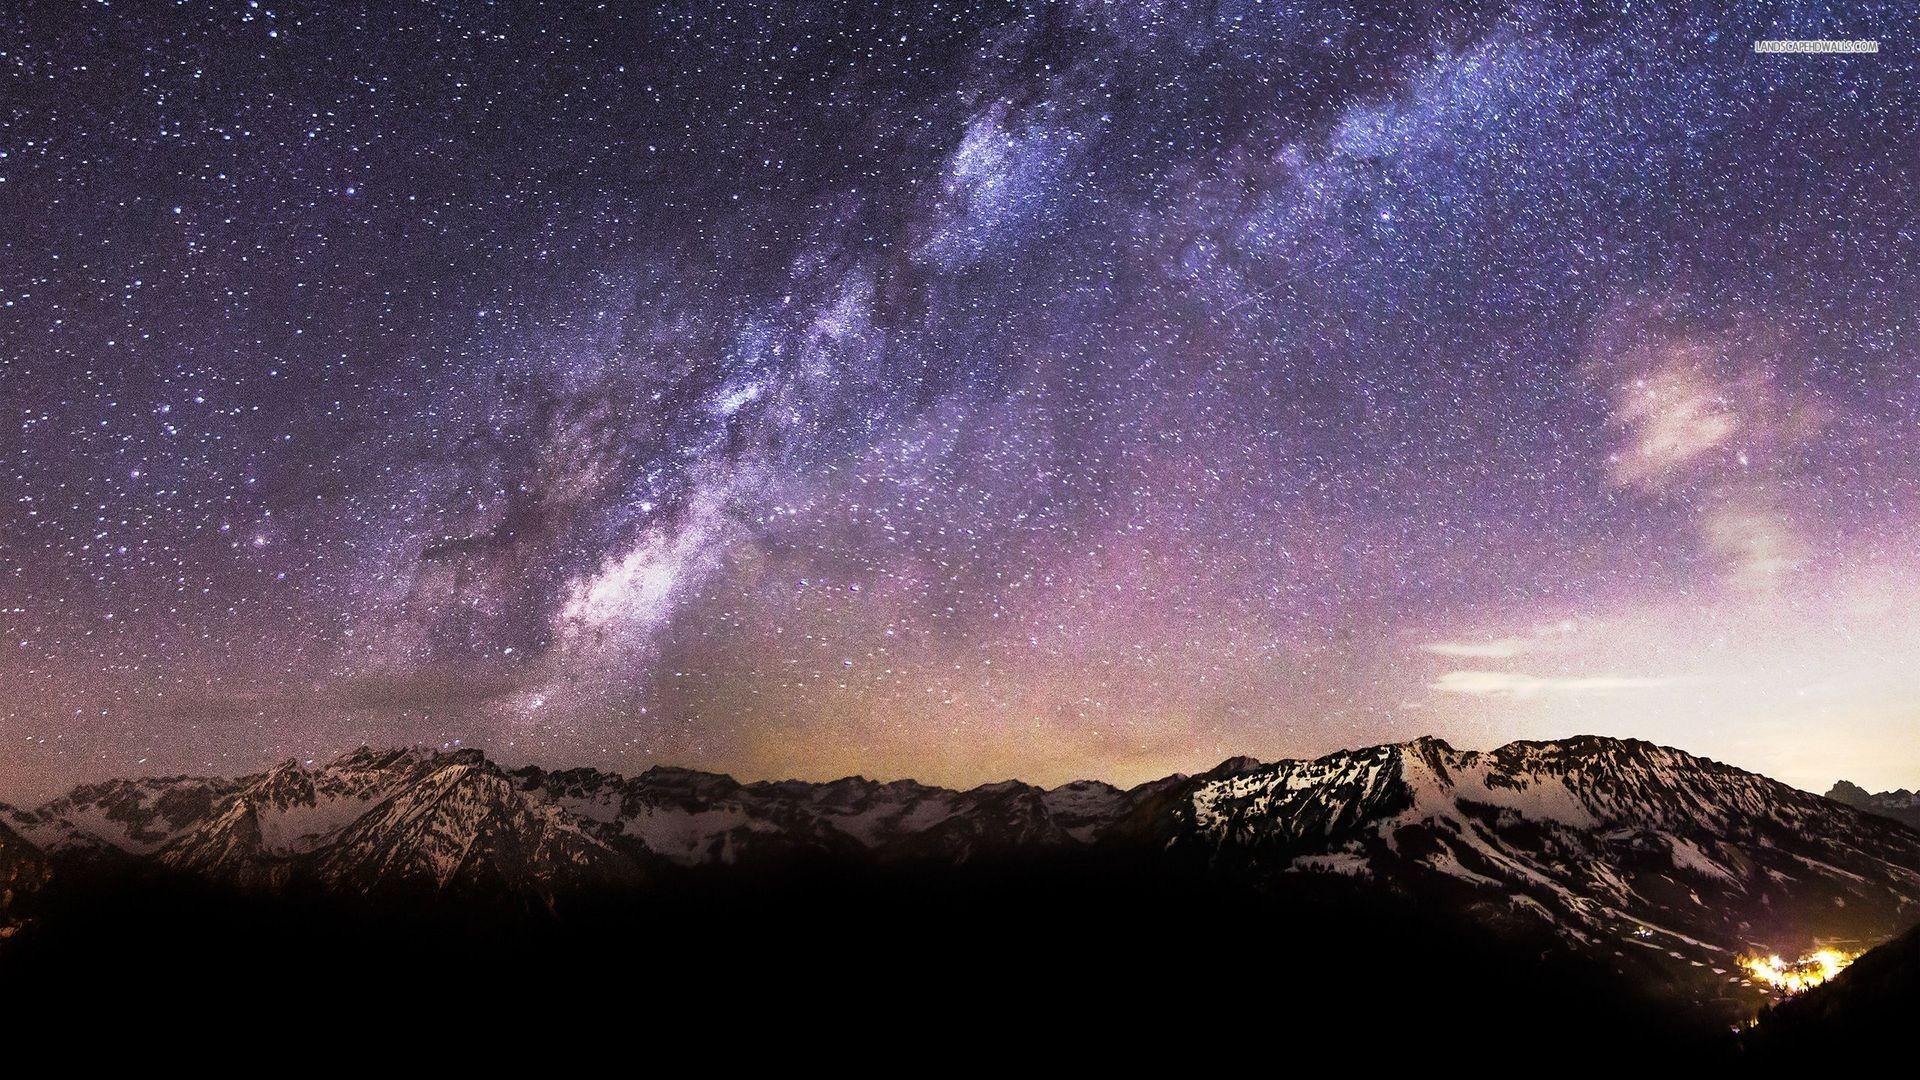 Milky Way Wallpaper 1080p – Wallpaper.